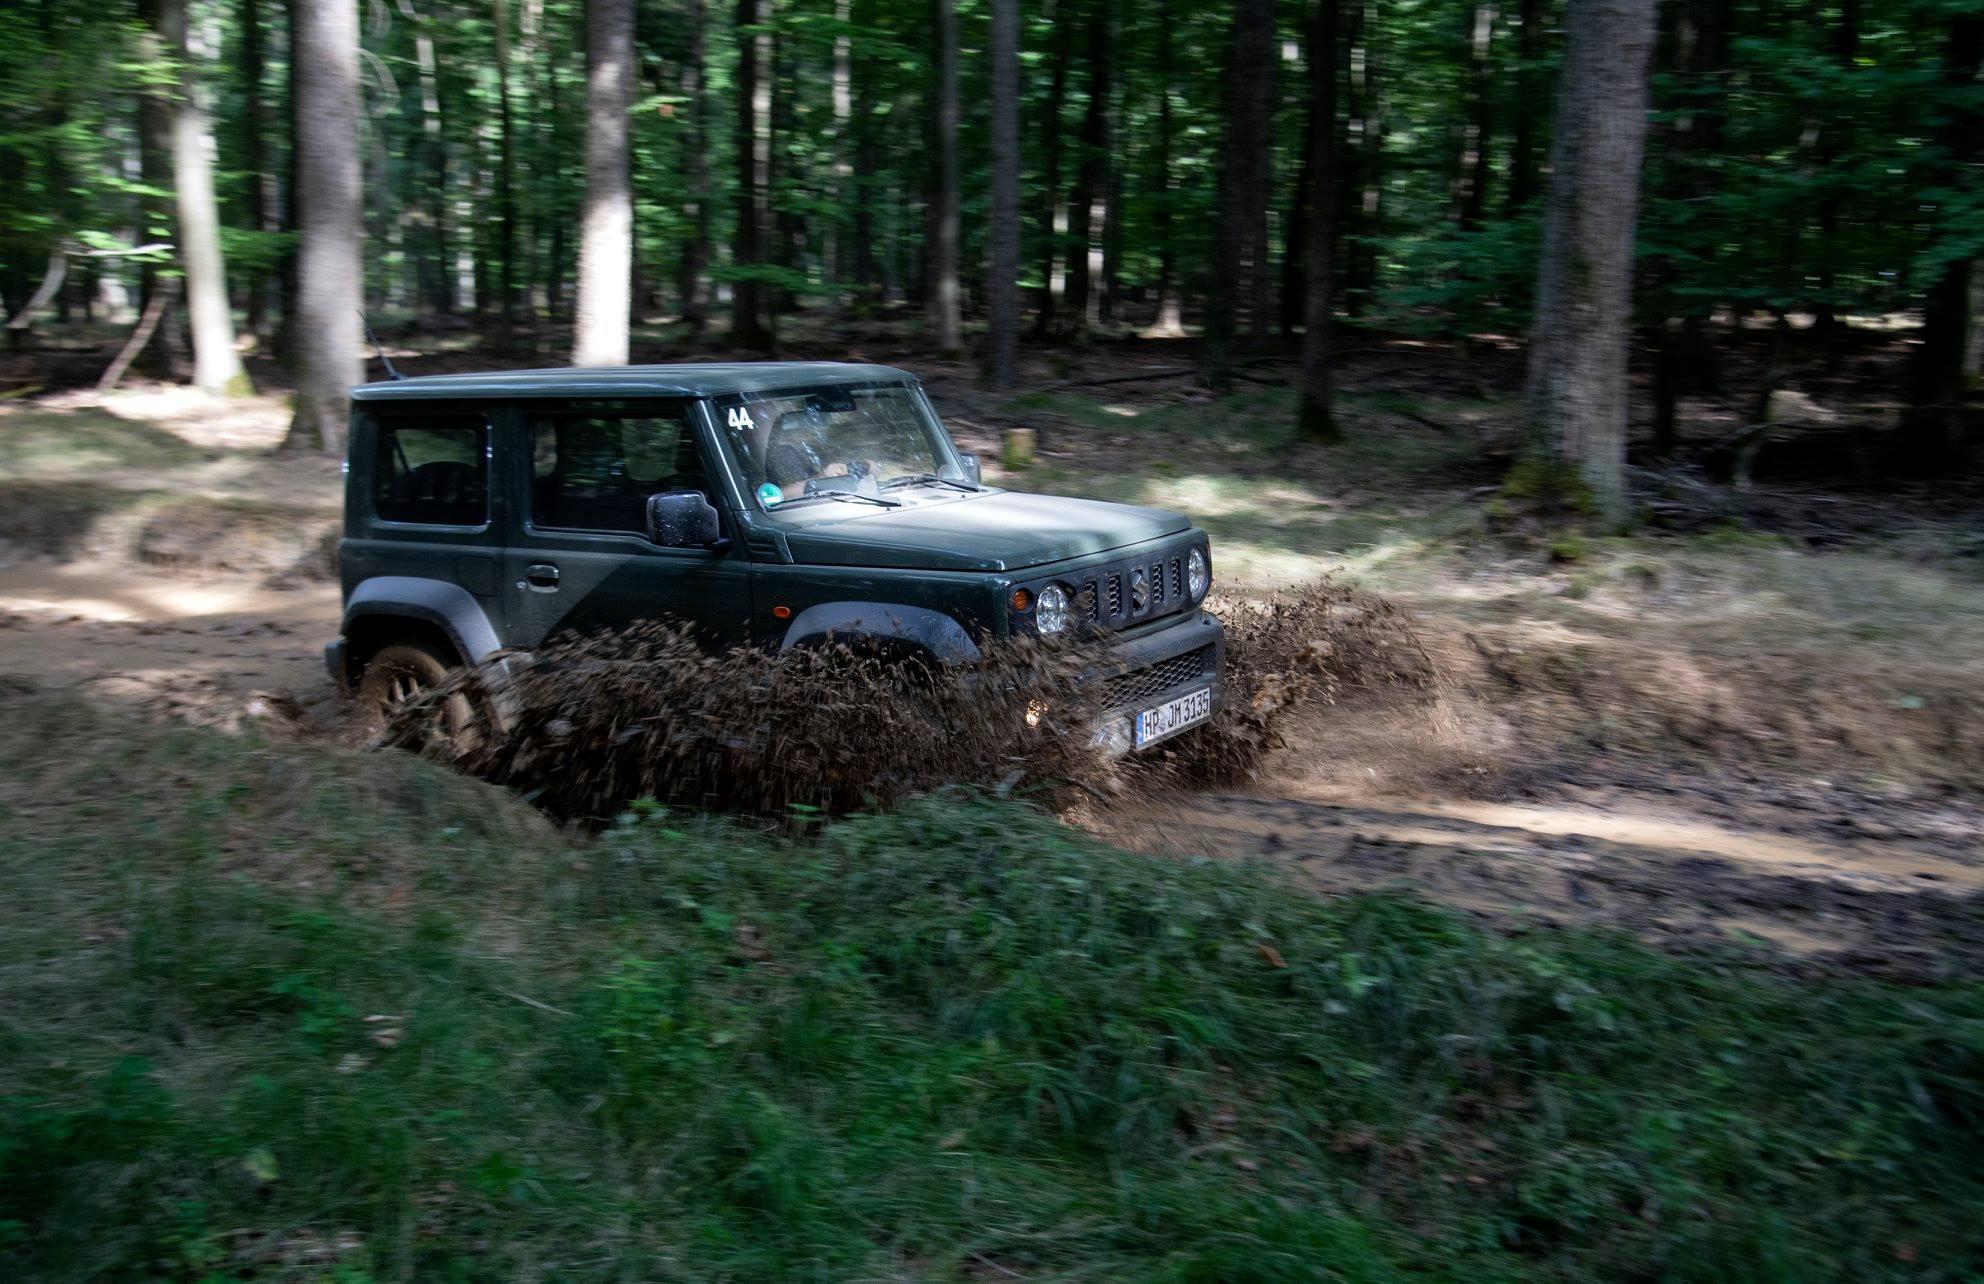 Suzuki Jimny through puddle